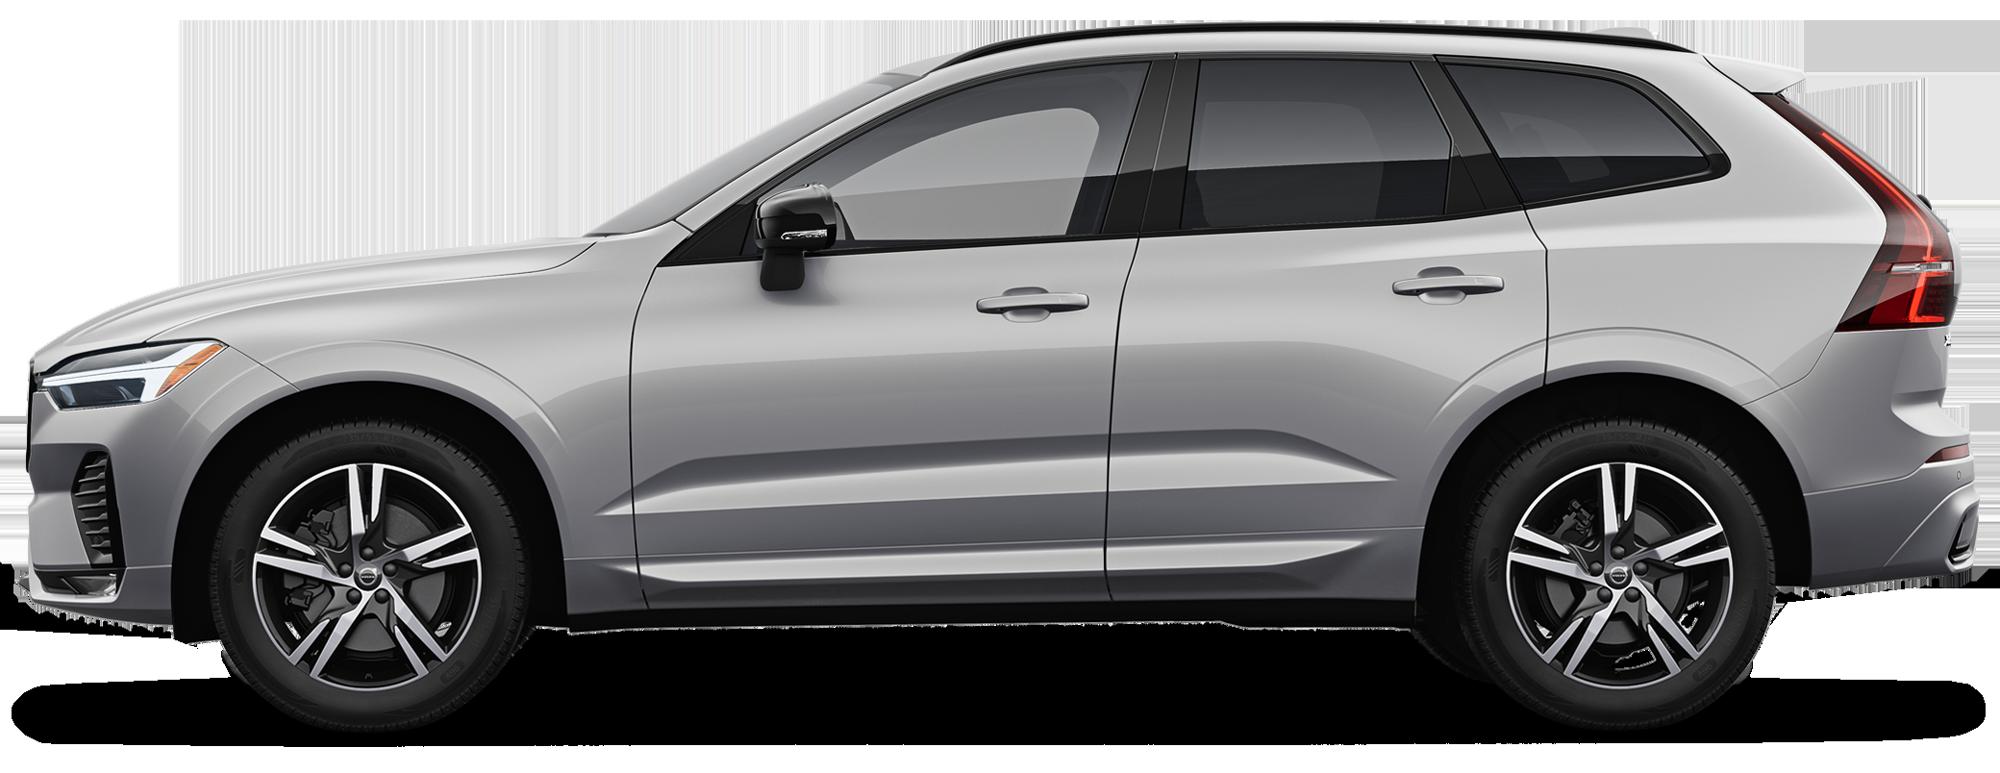 2022 Volvo XC60 SUV B5 FWD R-Design